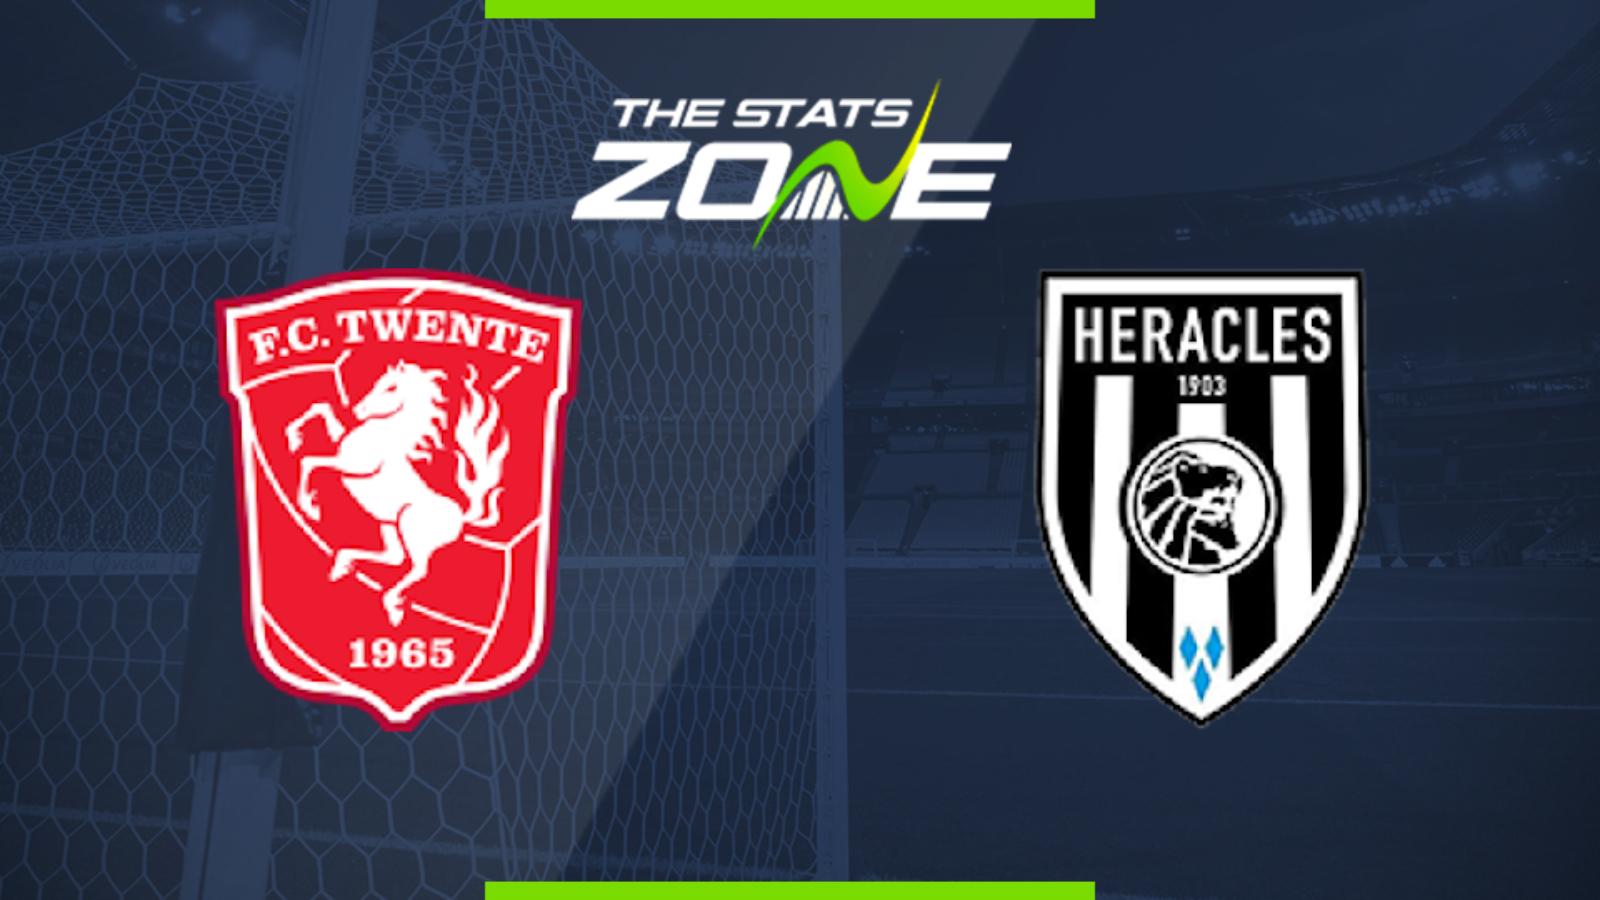 Twente vs heracles betting expert nfl pariuri sportive live betting